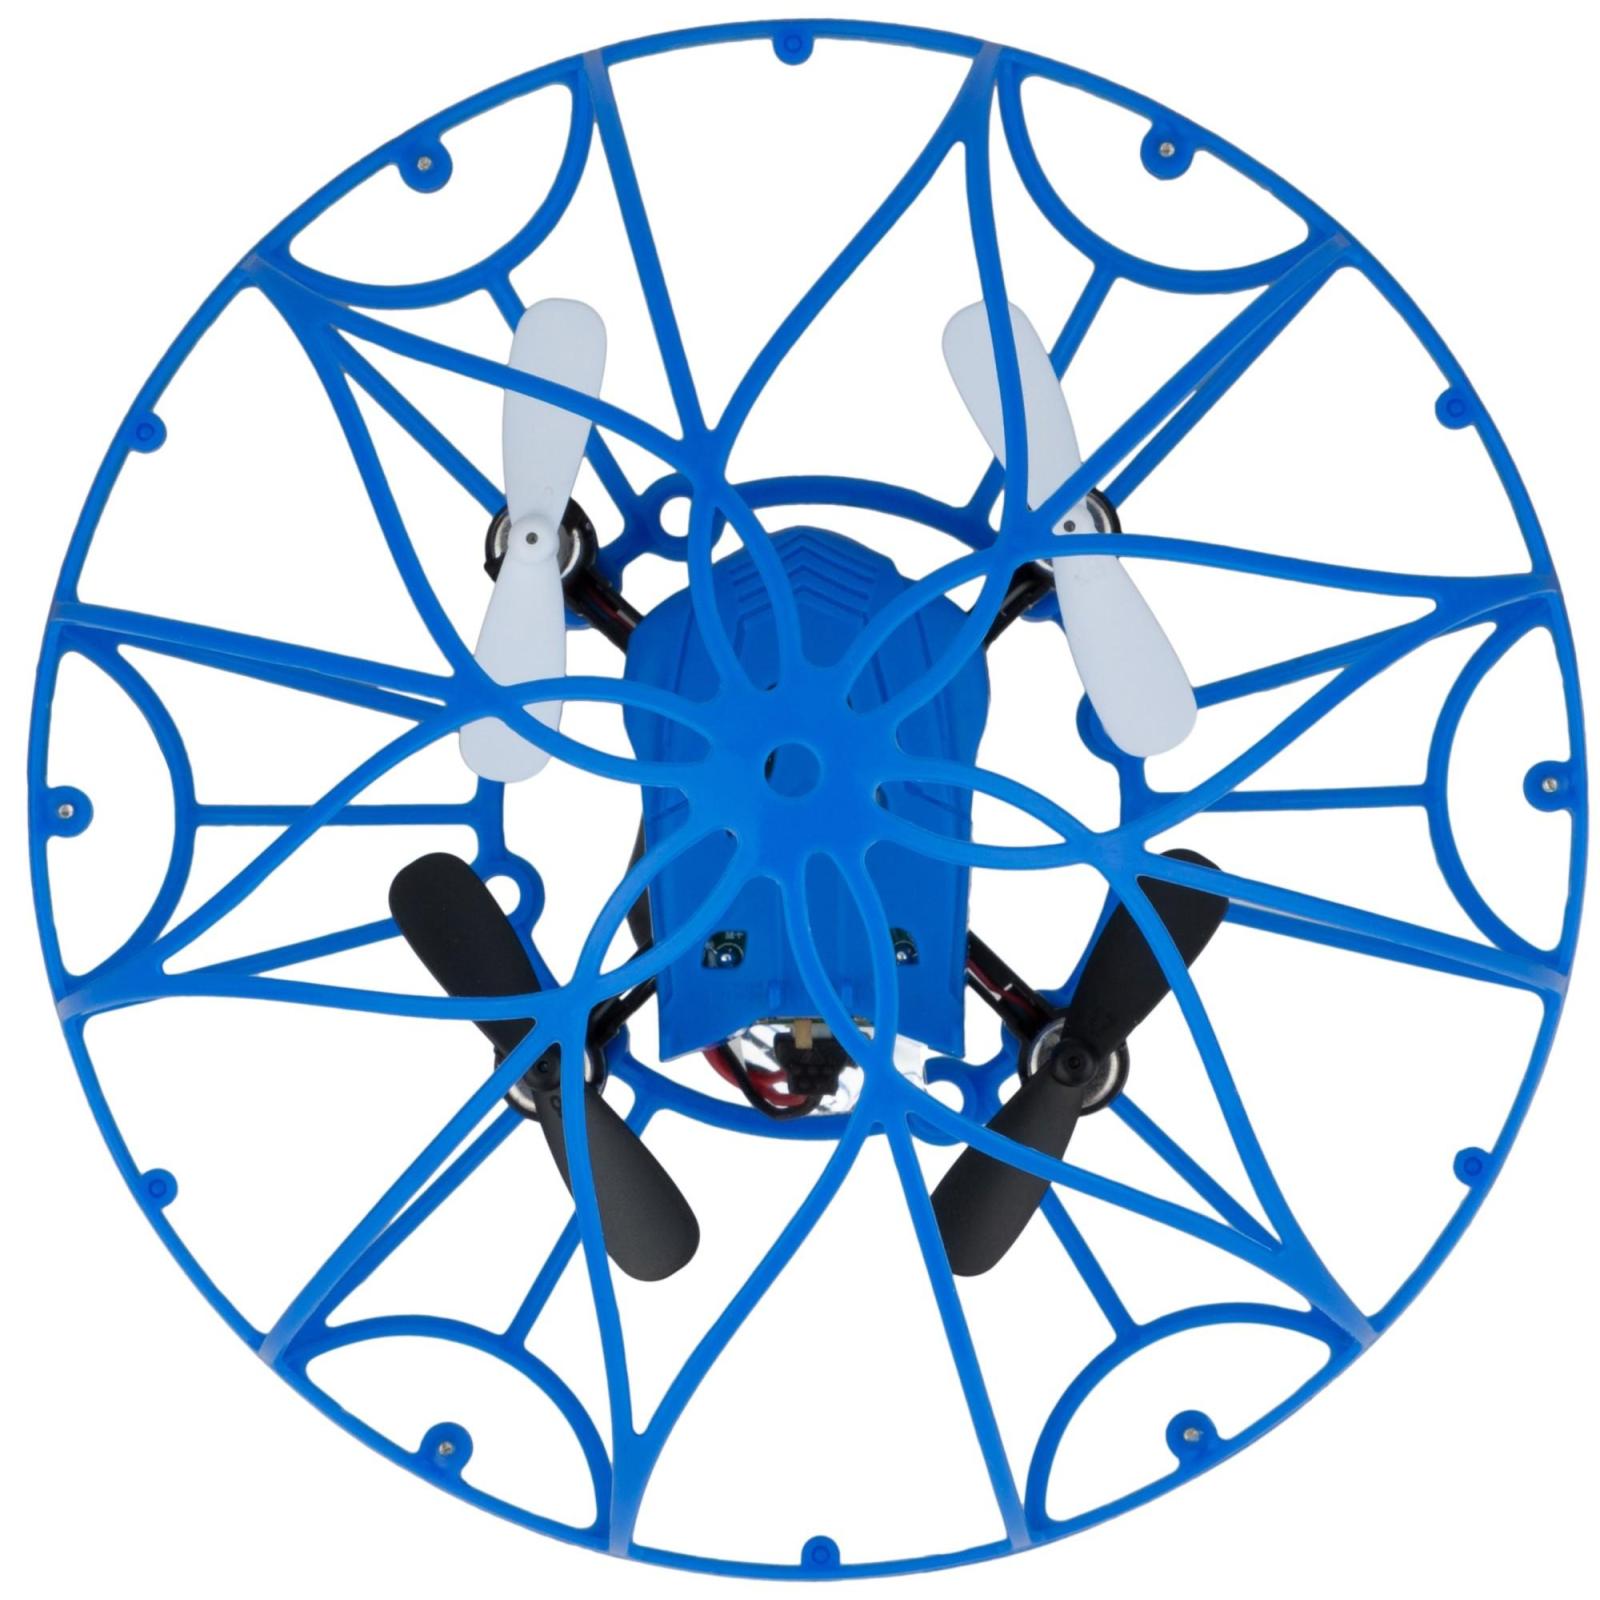 Квадрокоптер Skytech M73 Mini 6 Axis (blue) изображение 2